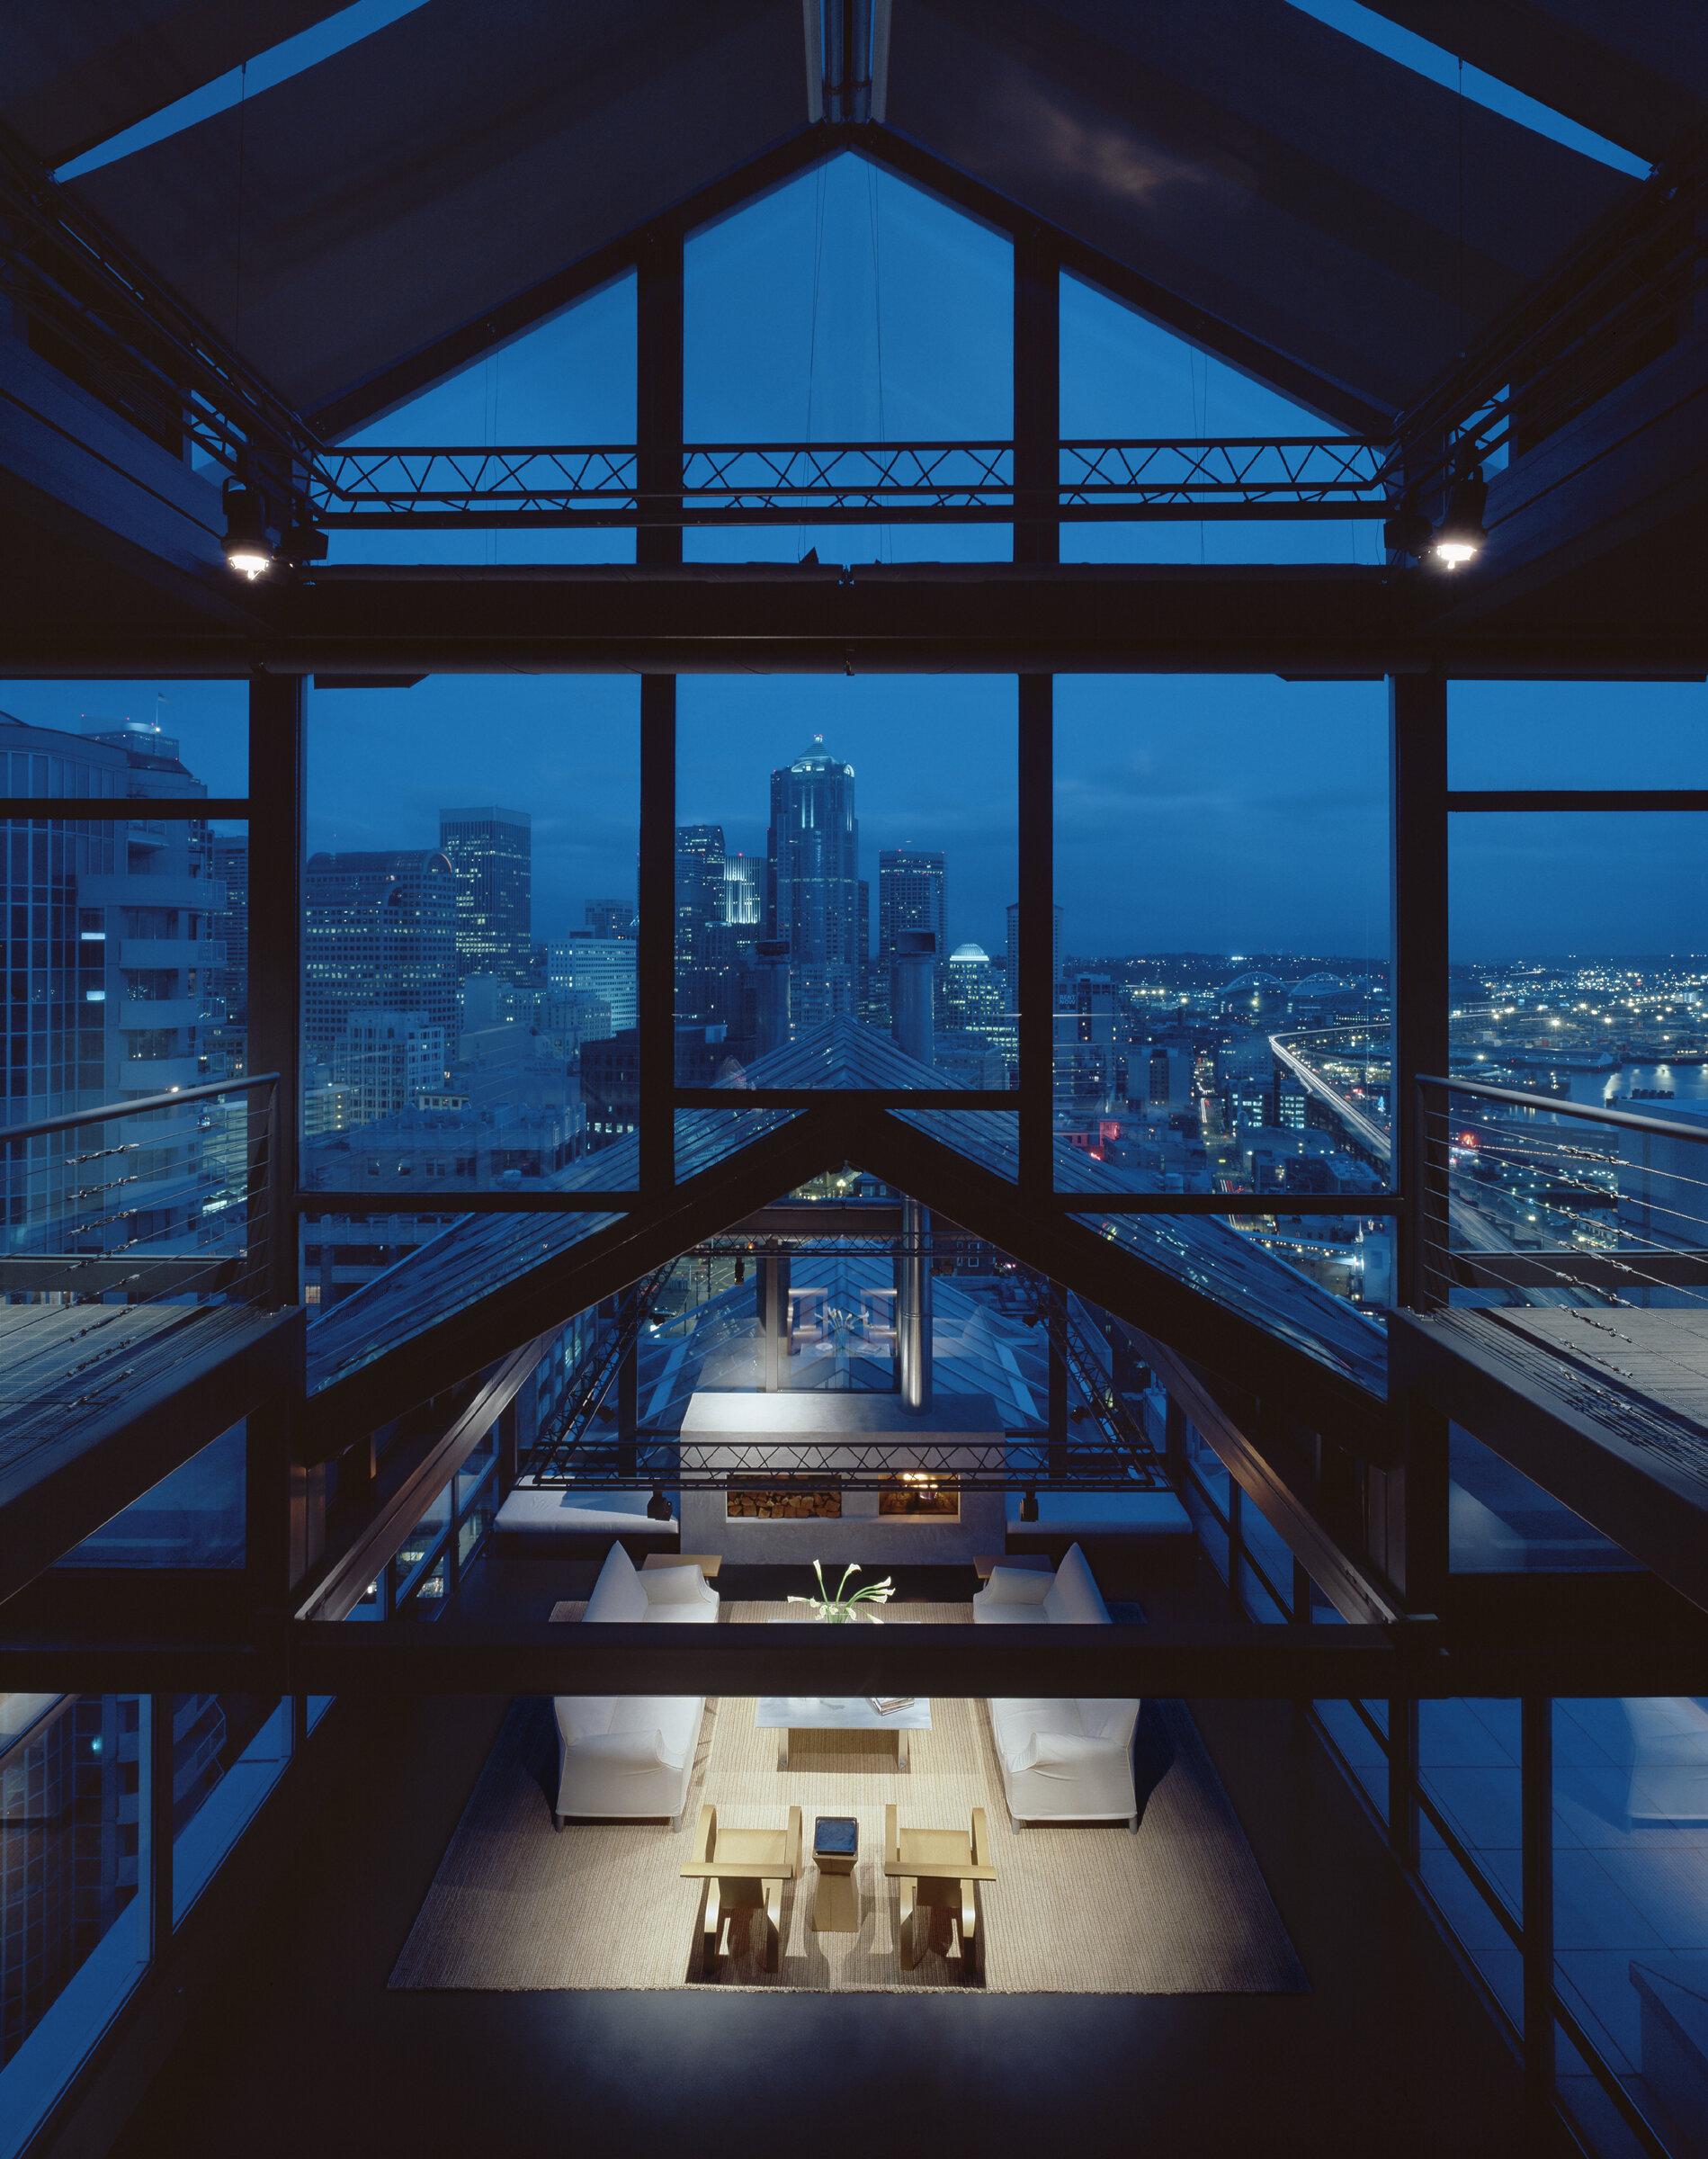 1 Glaser living room view (iconic).jpg